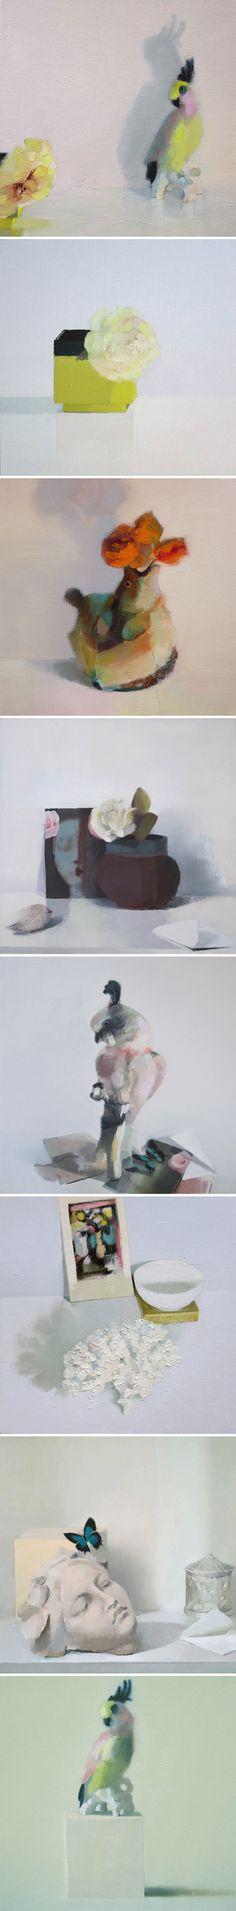 The Jealous Curator /// curated contemporary art /// stephanie london